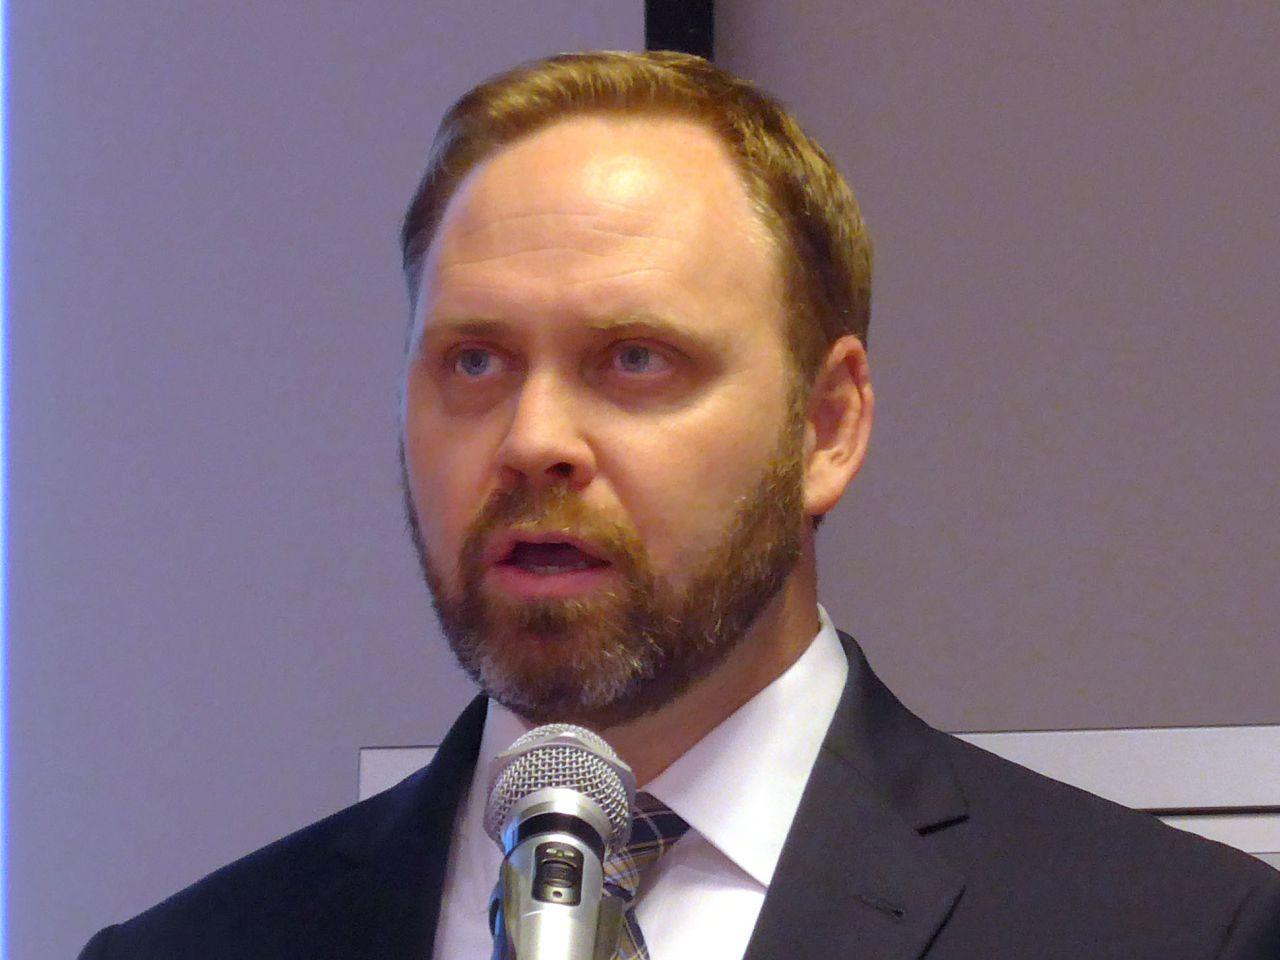 Wi-Fi Allianceマーケティング担当バイスプレジデントのケビン・ロビンソン氏